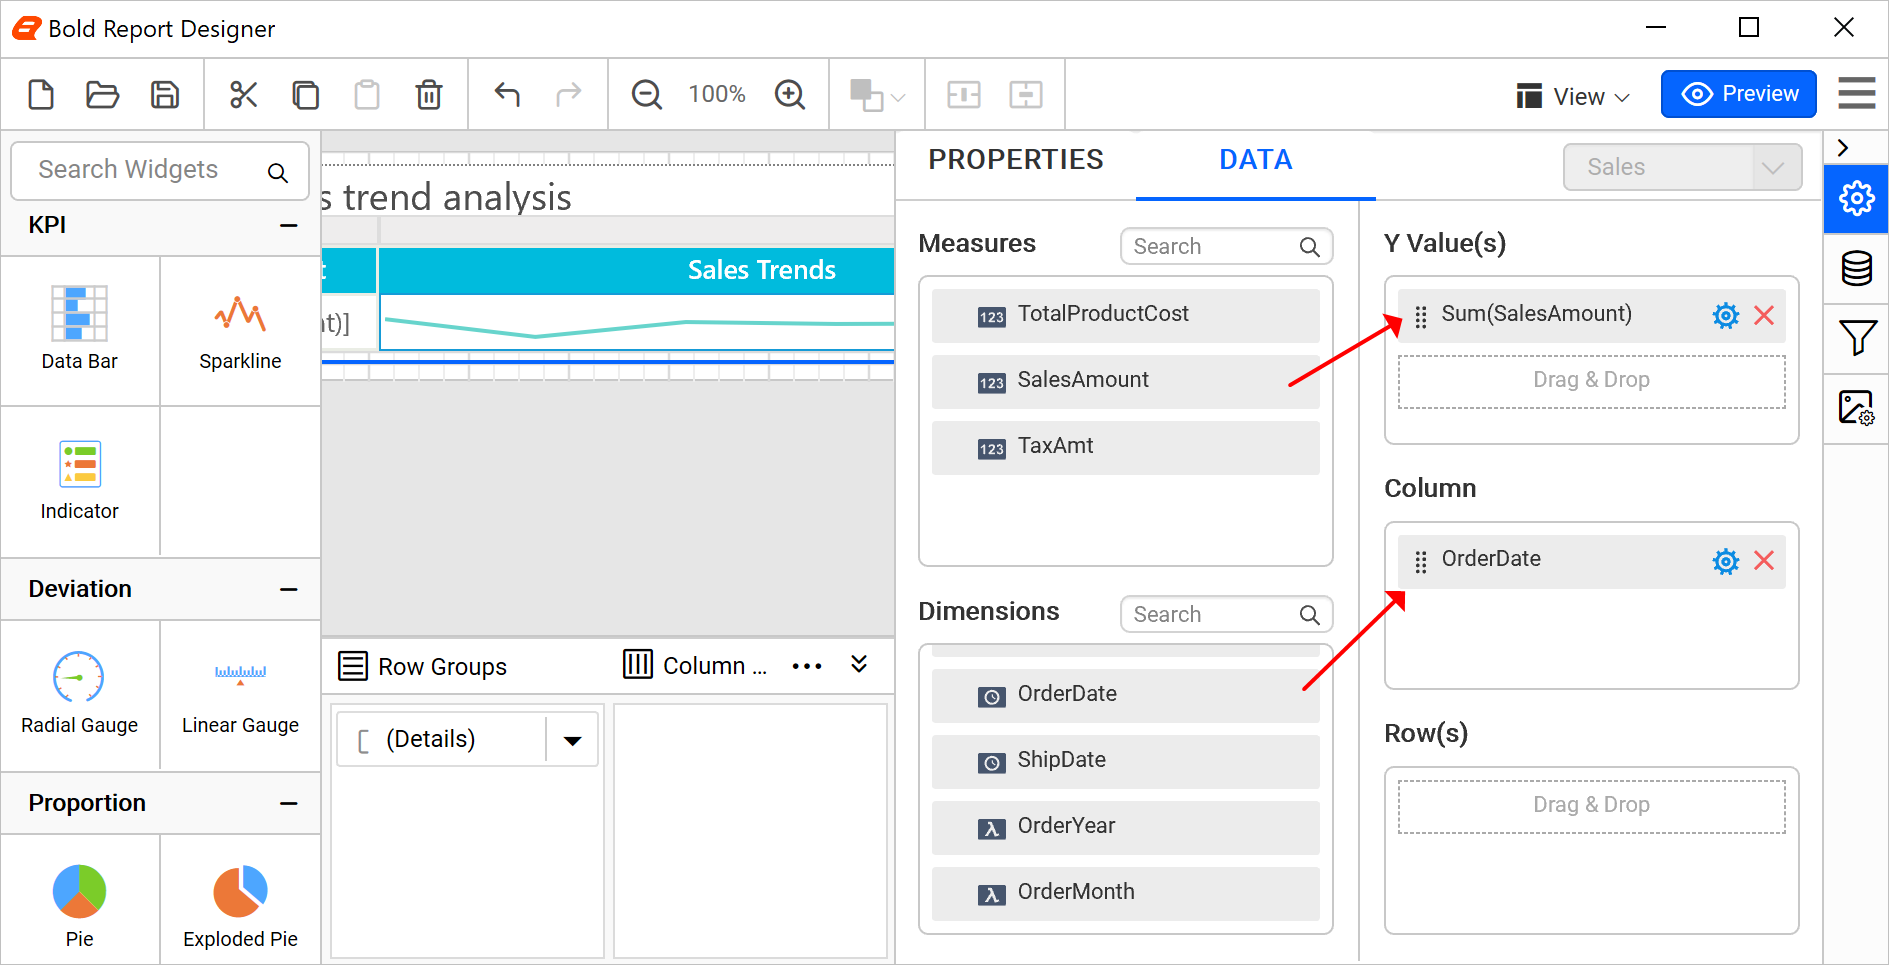 Configuring data in the sparkline